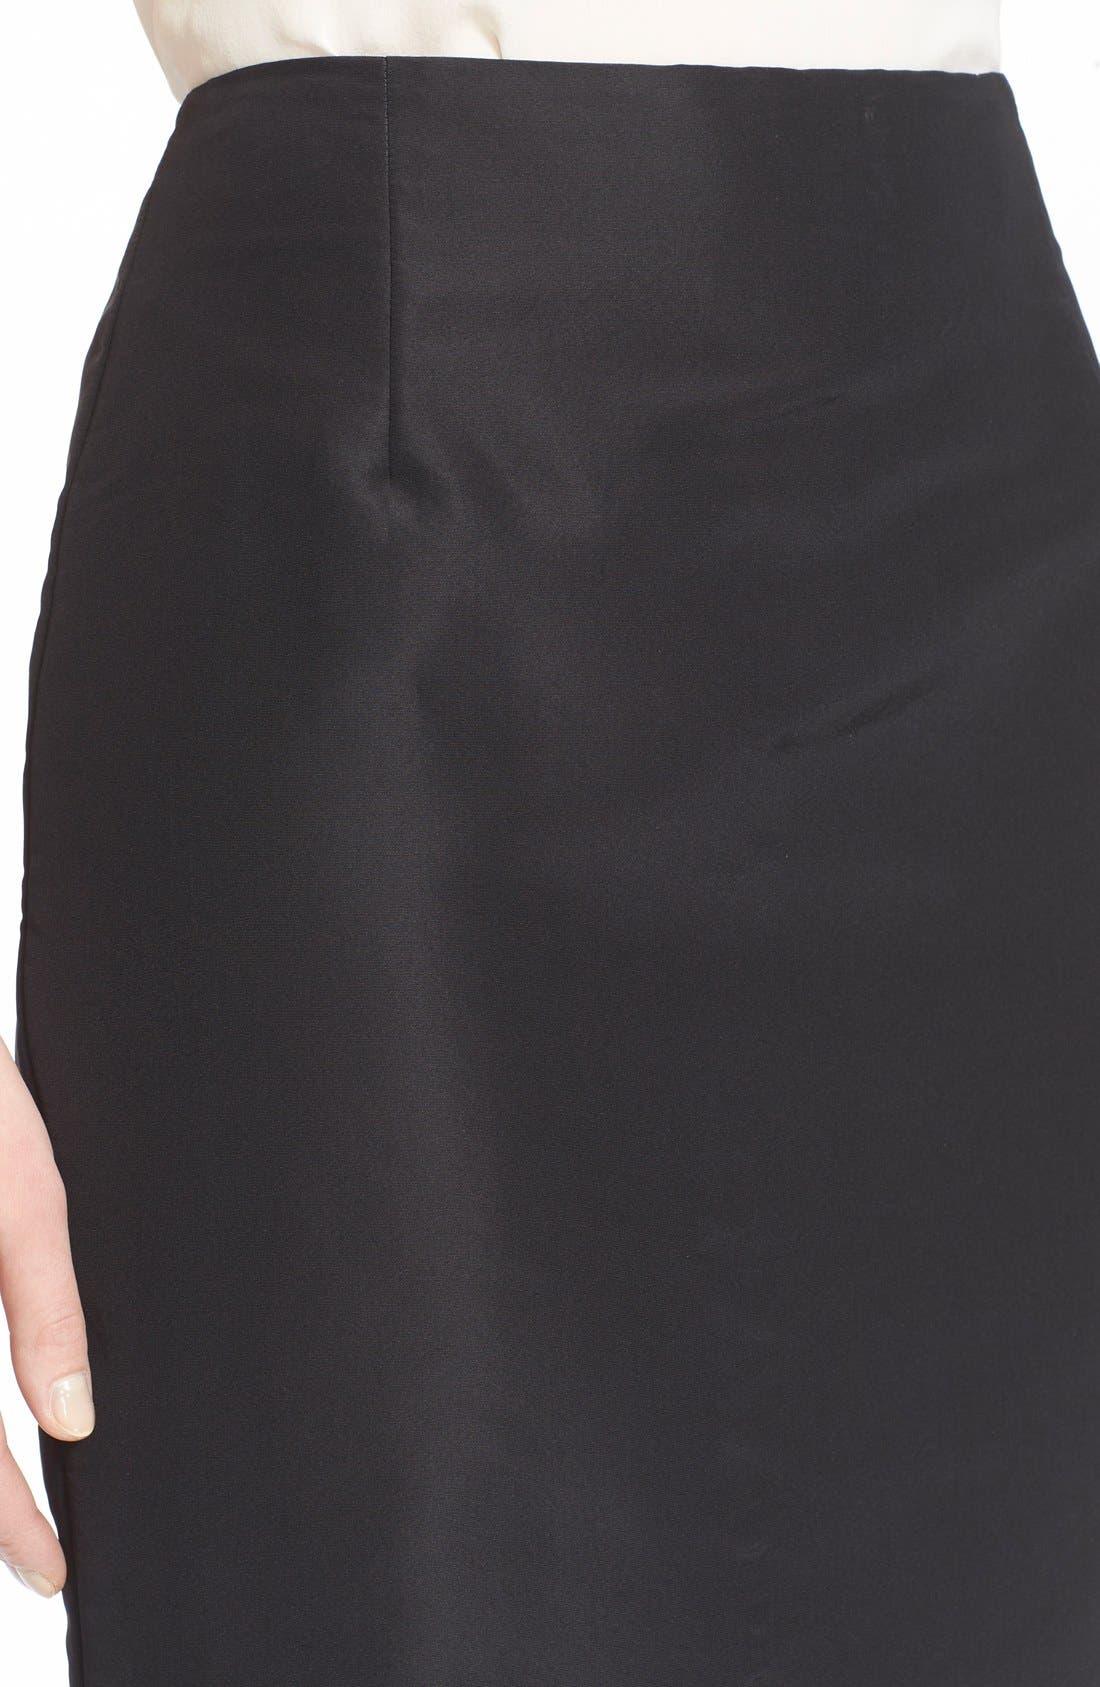 Silk Pencil Skirt,                             Alternate thumbnail 5, color,                             Black